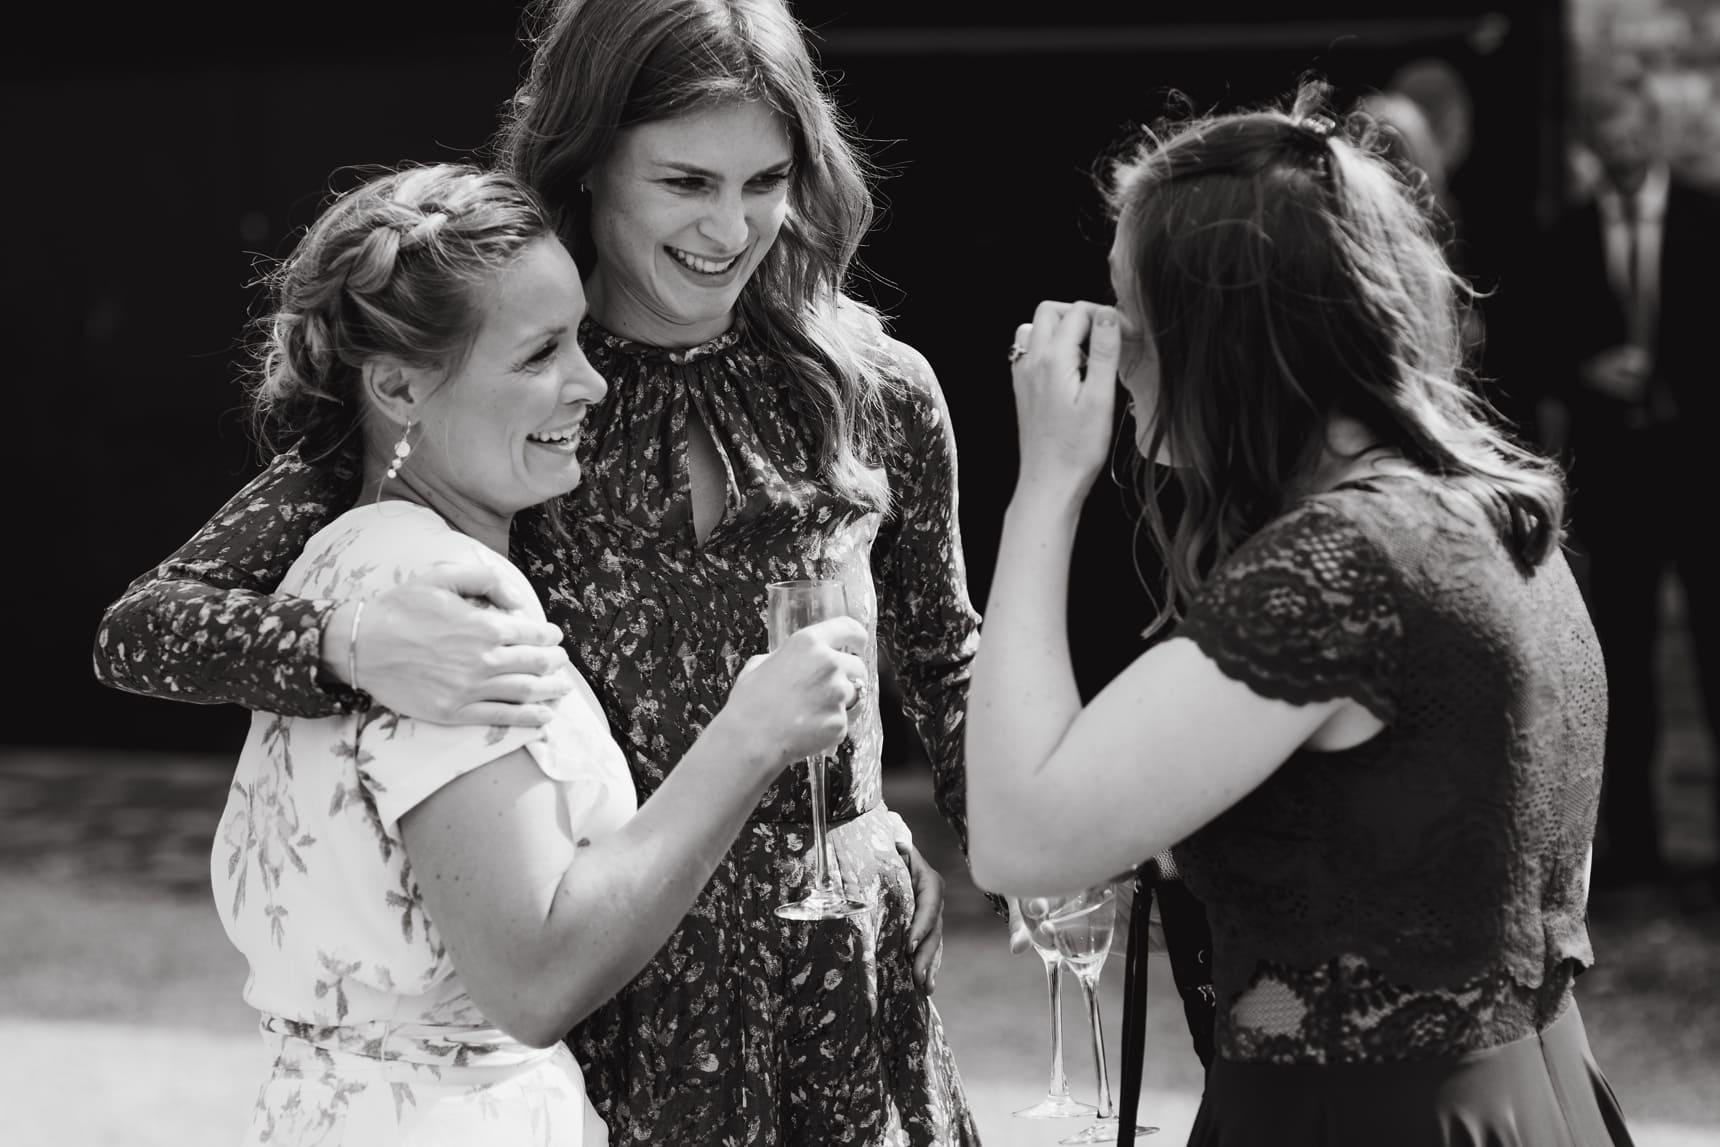 friends at weddings